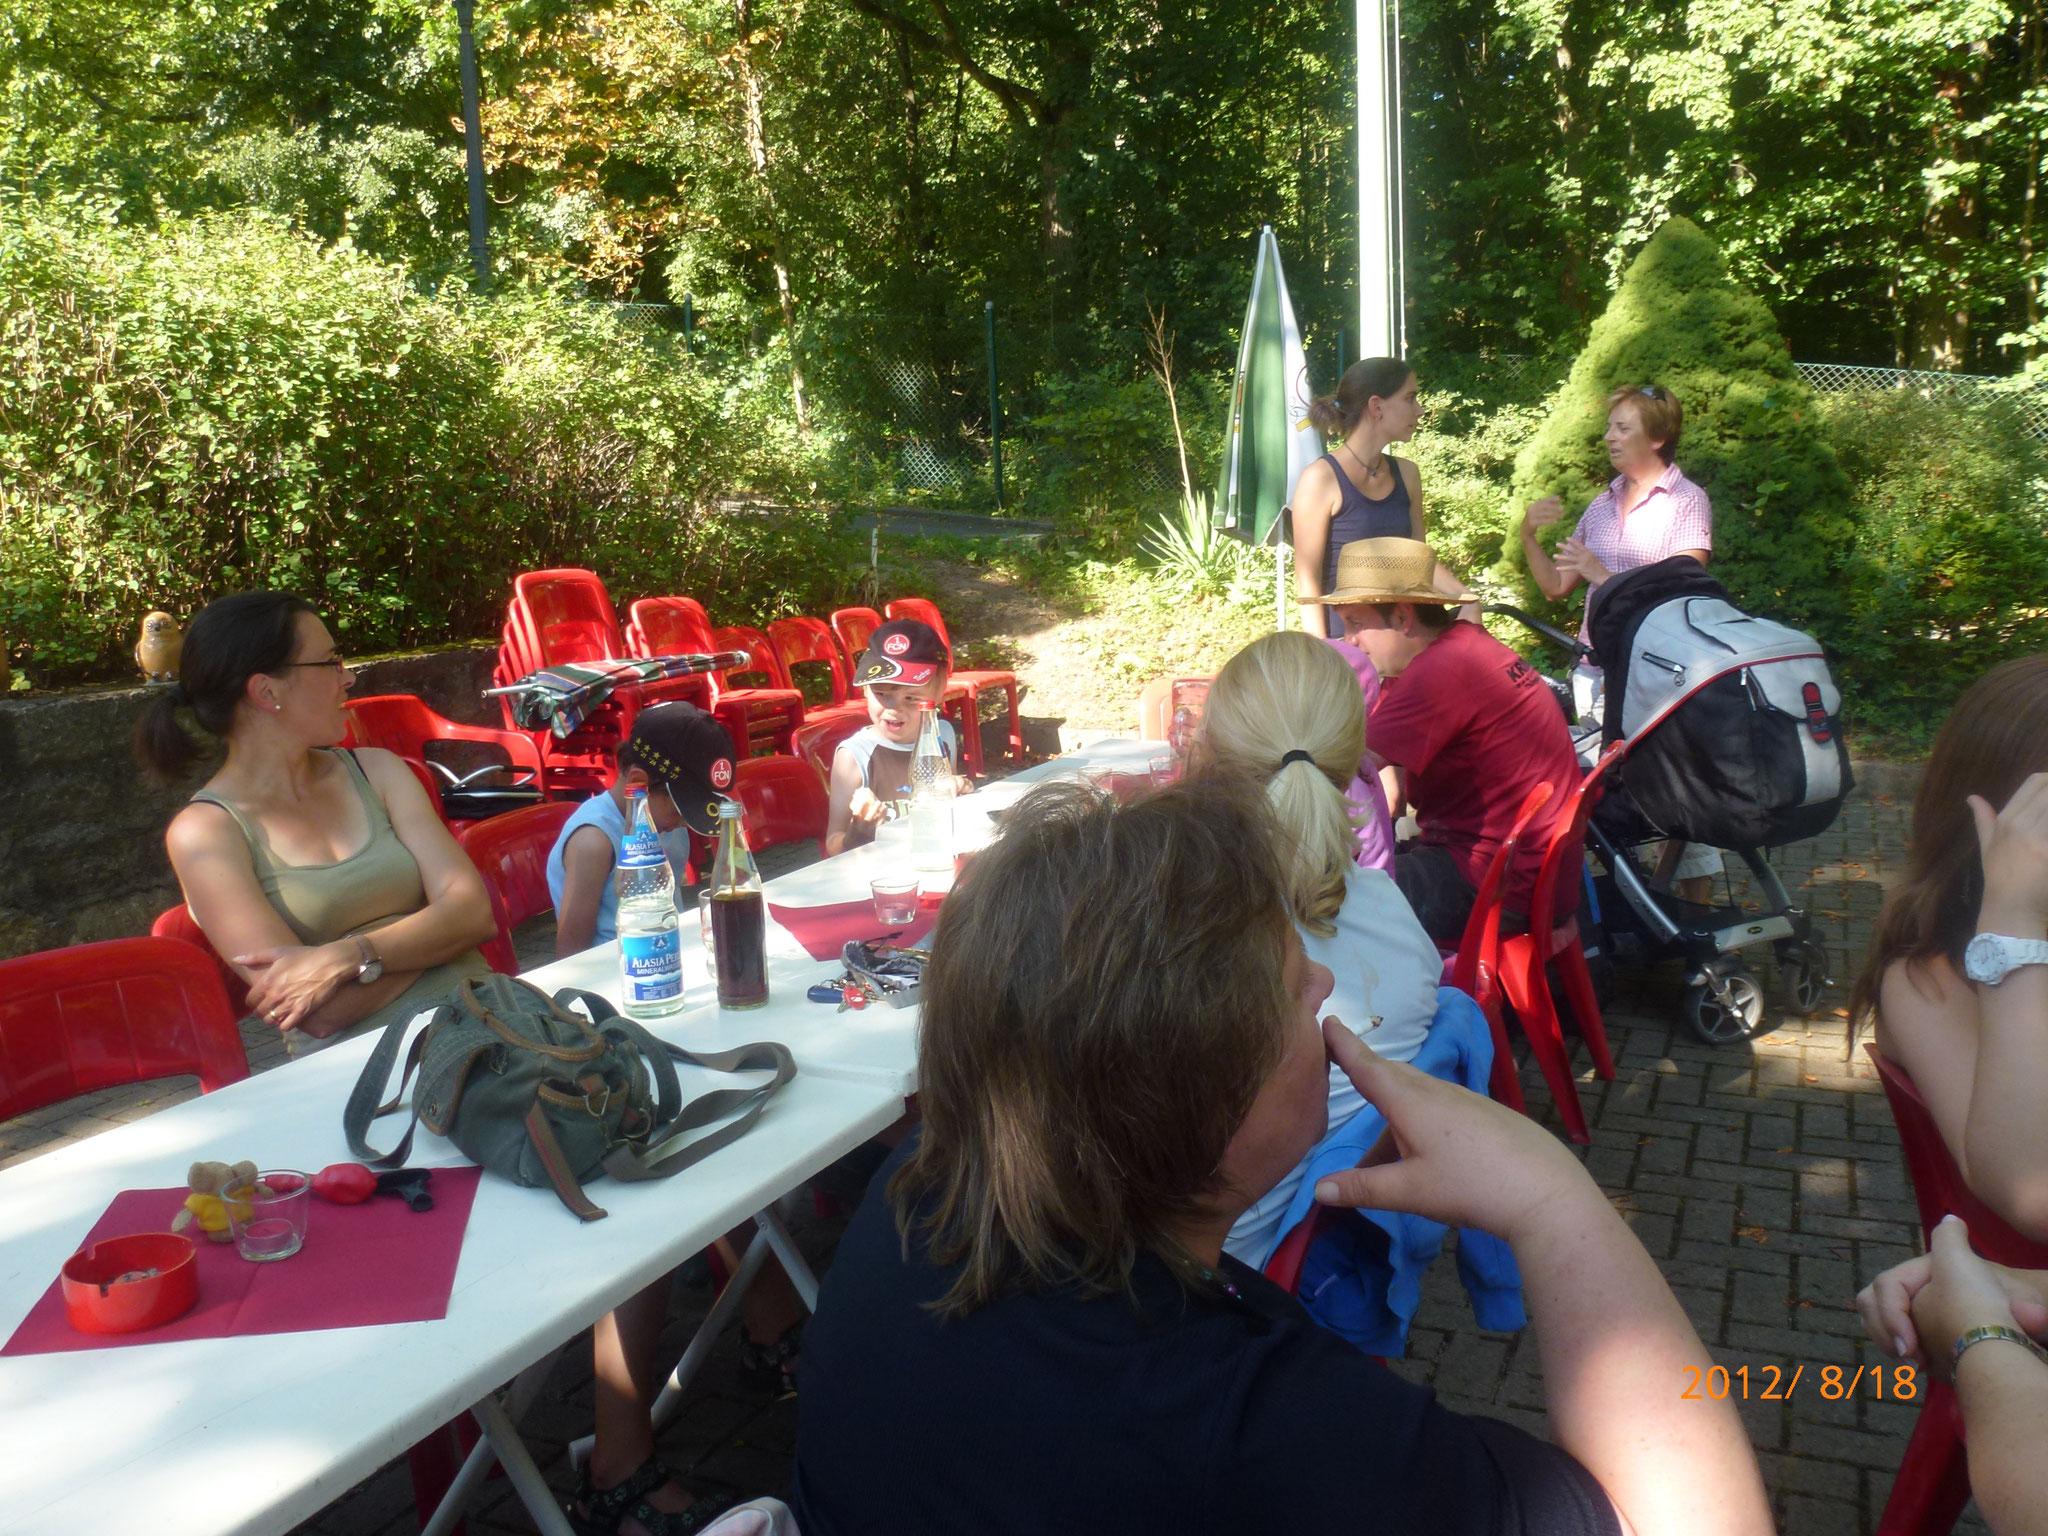 Sommerfest am Naturfreundehaus am 18.08.2012